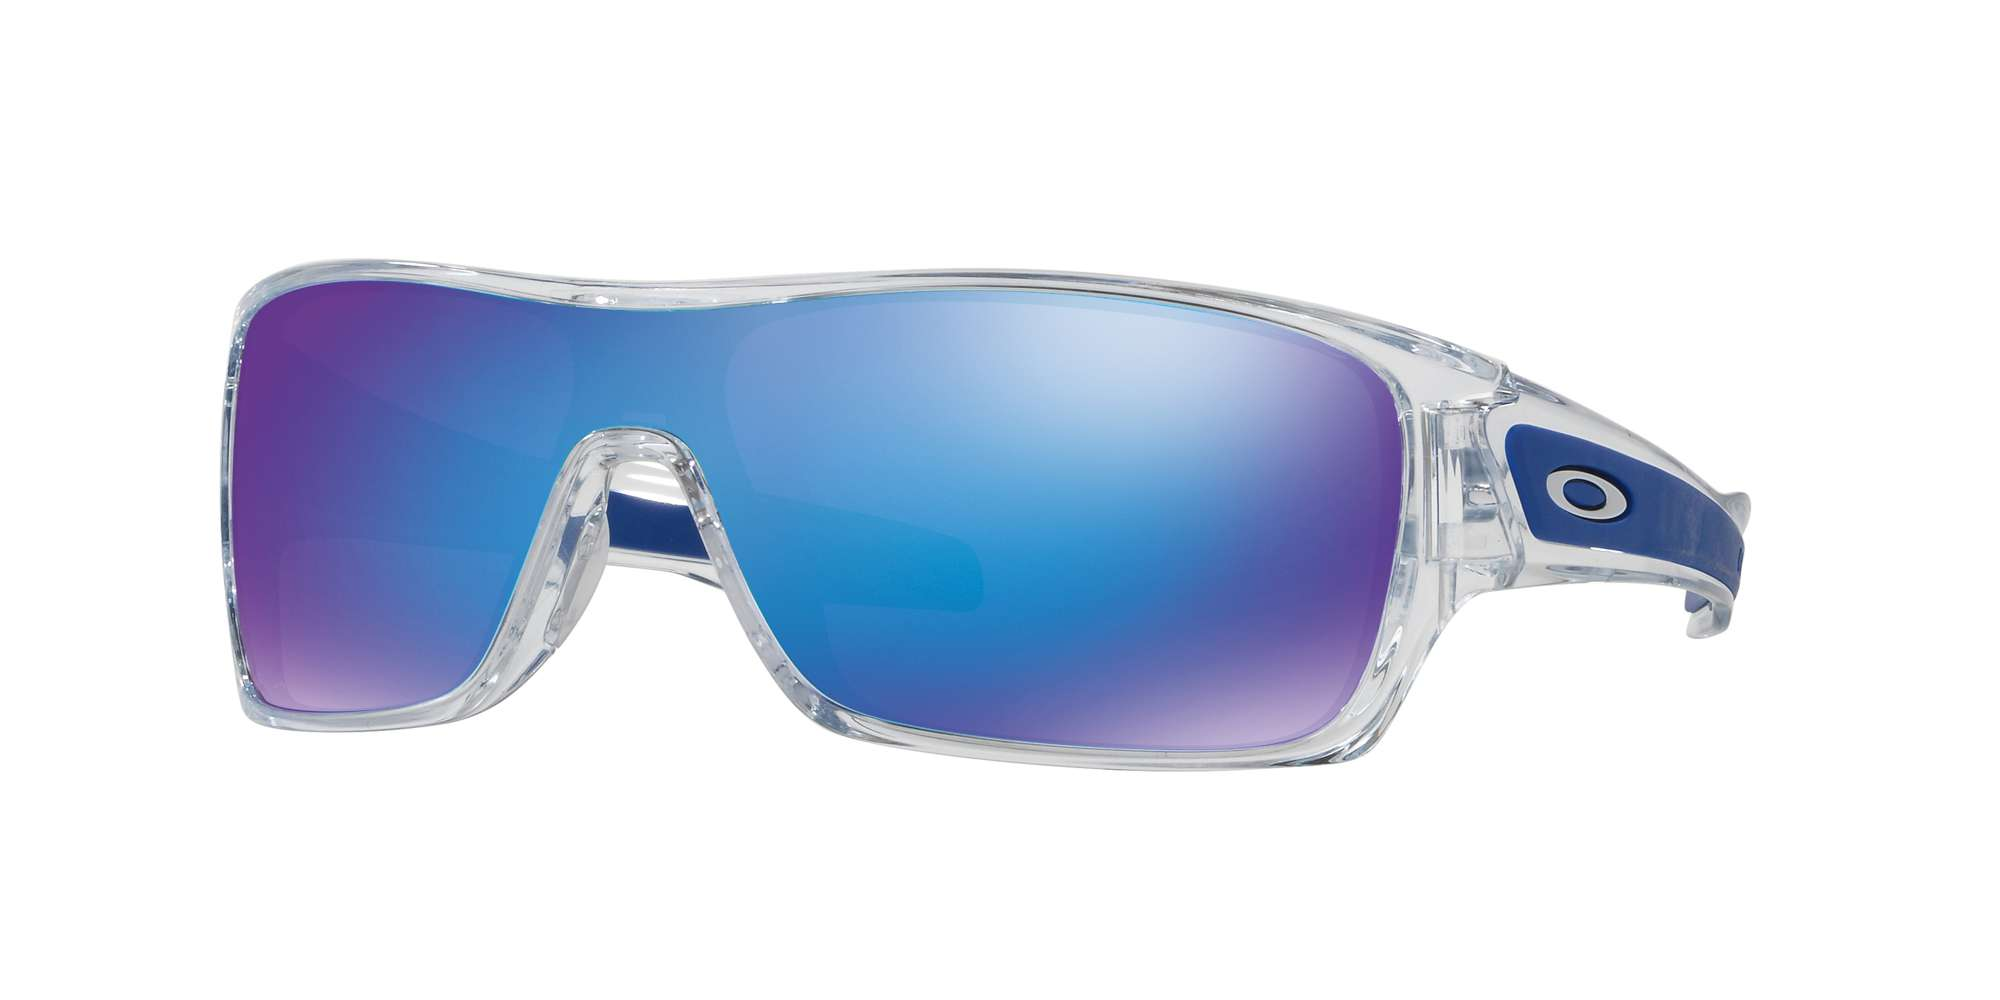 POLISHED CLEAR / SAPPHIRE IRIDIUM lenses